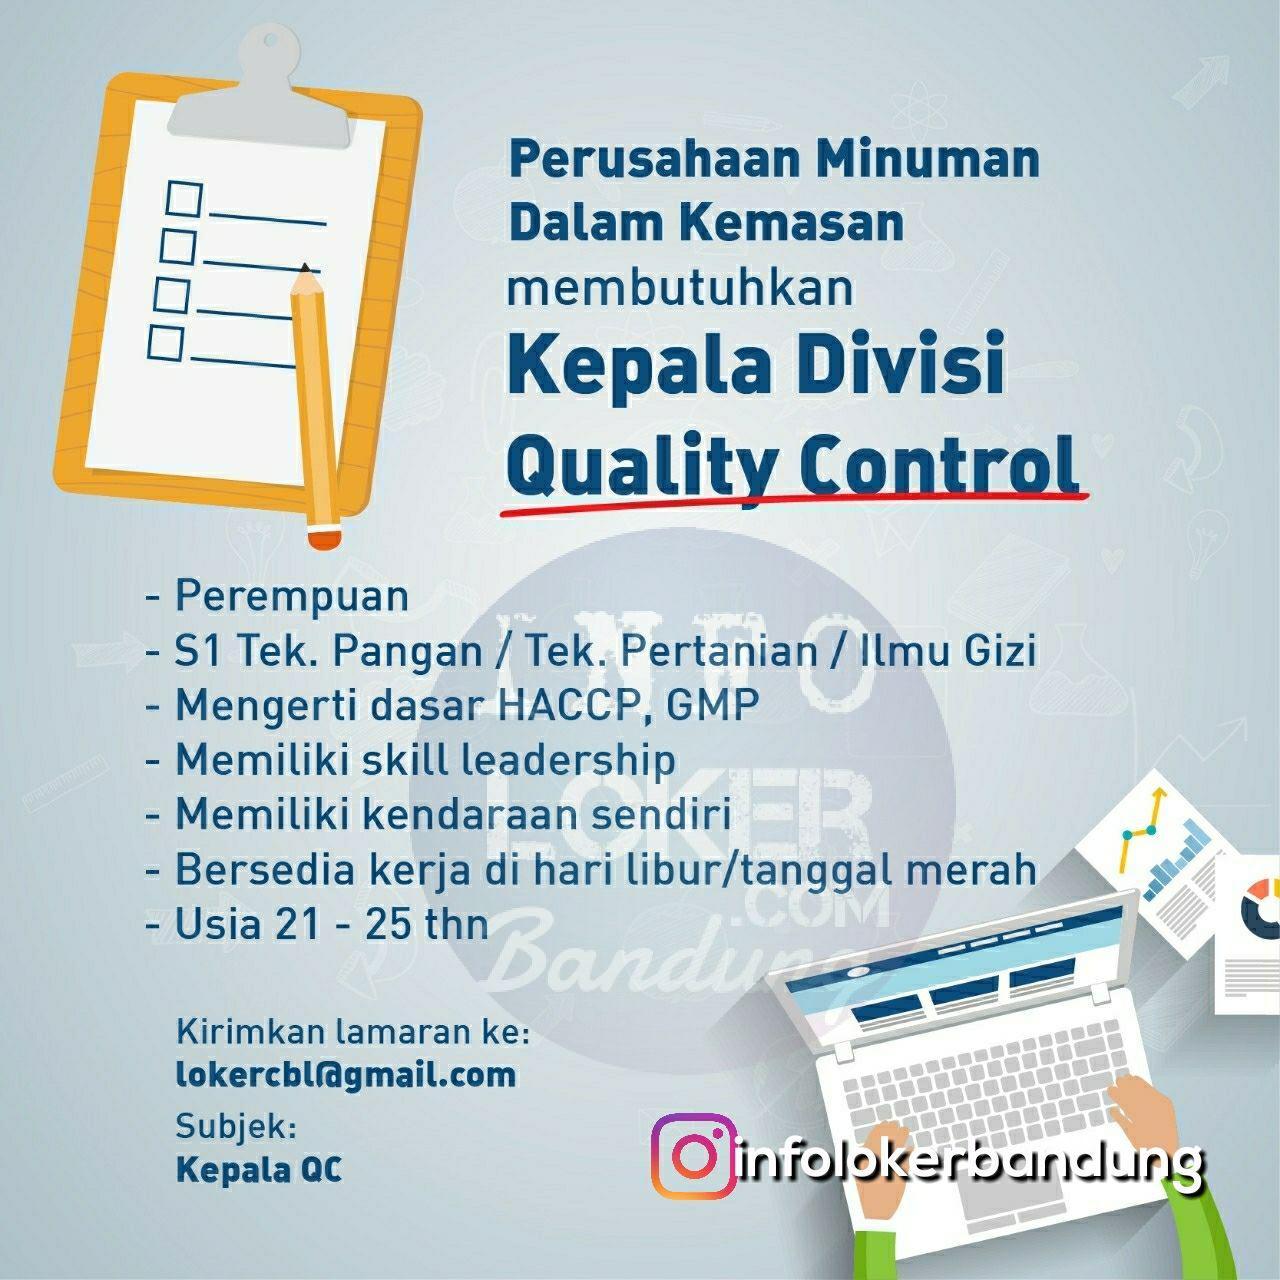 Lowongan Kerja Kepala Divisi Quality Control Perusahaan Minuman Dalam Kemasan Bandung April 2018